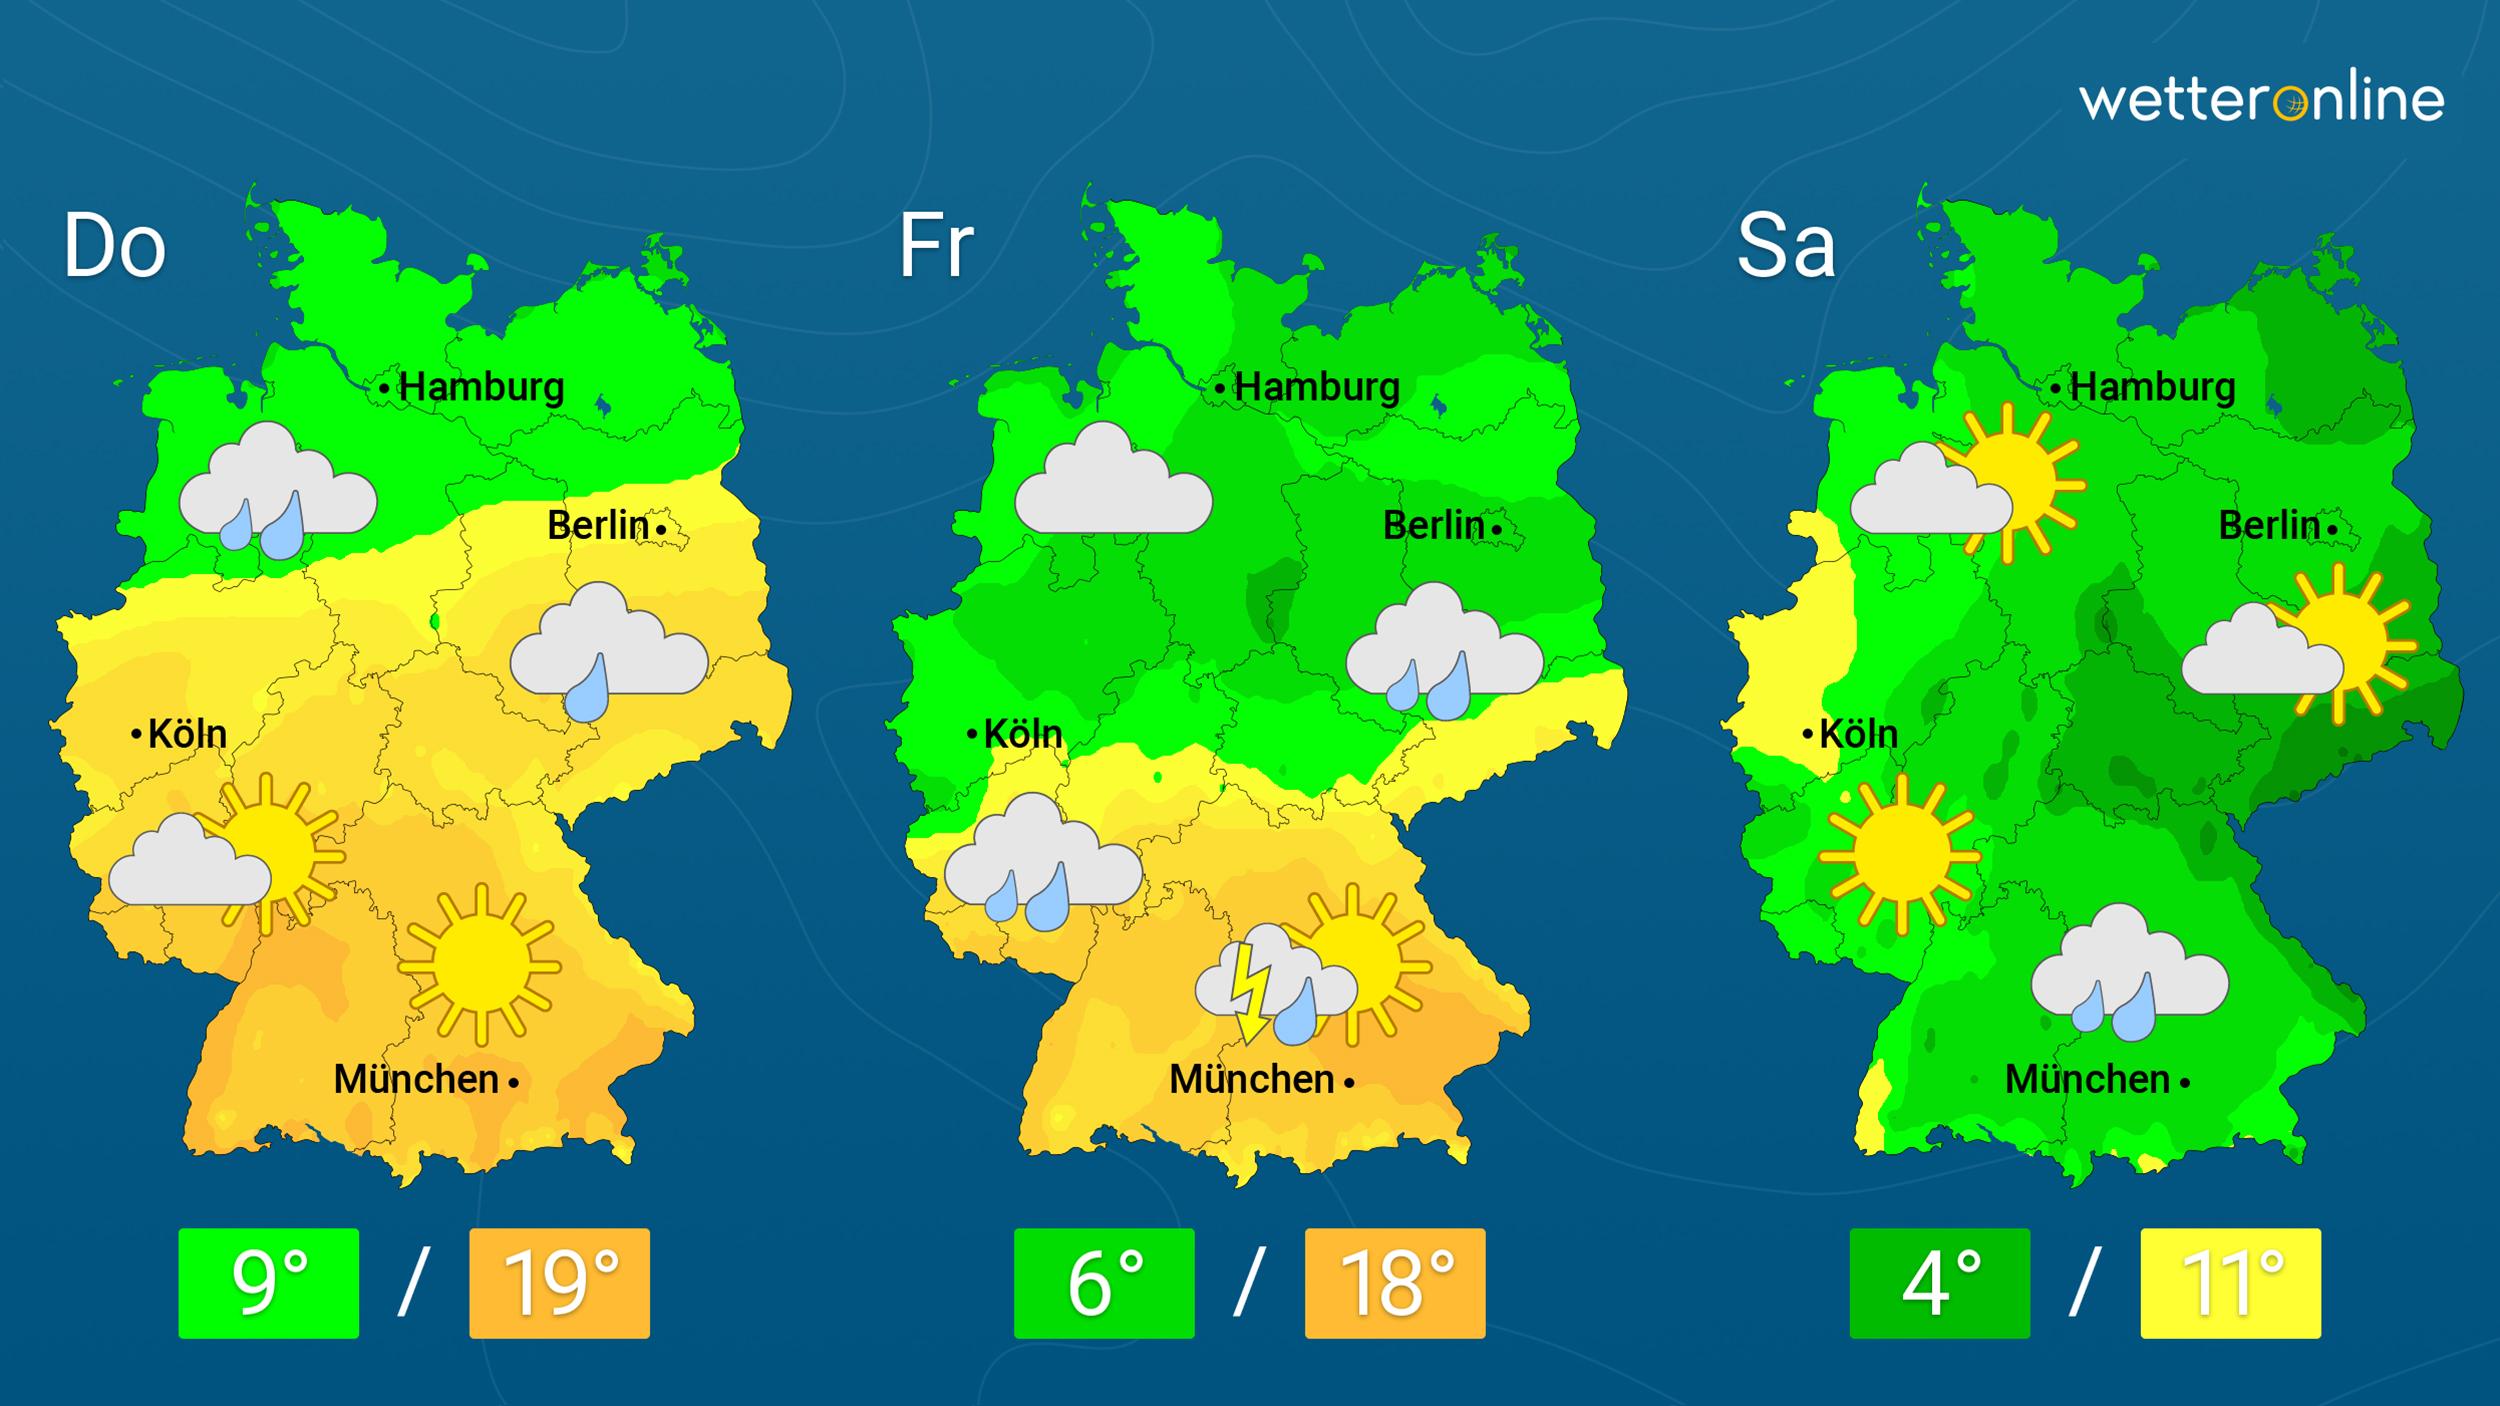 wetter_wetterkarte_karte_wetterbericht_wetteronline_temperaturen